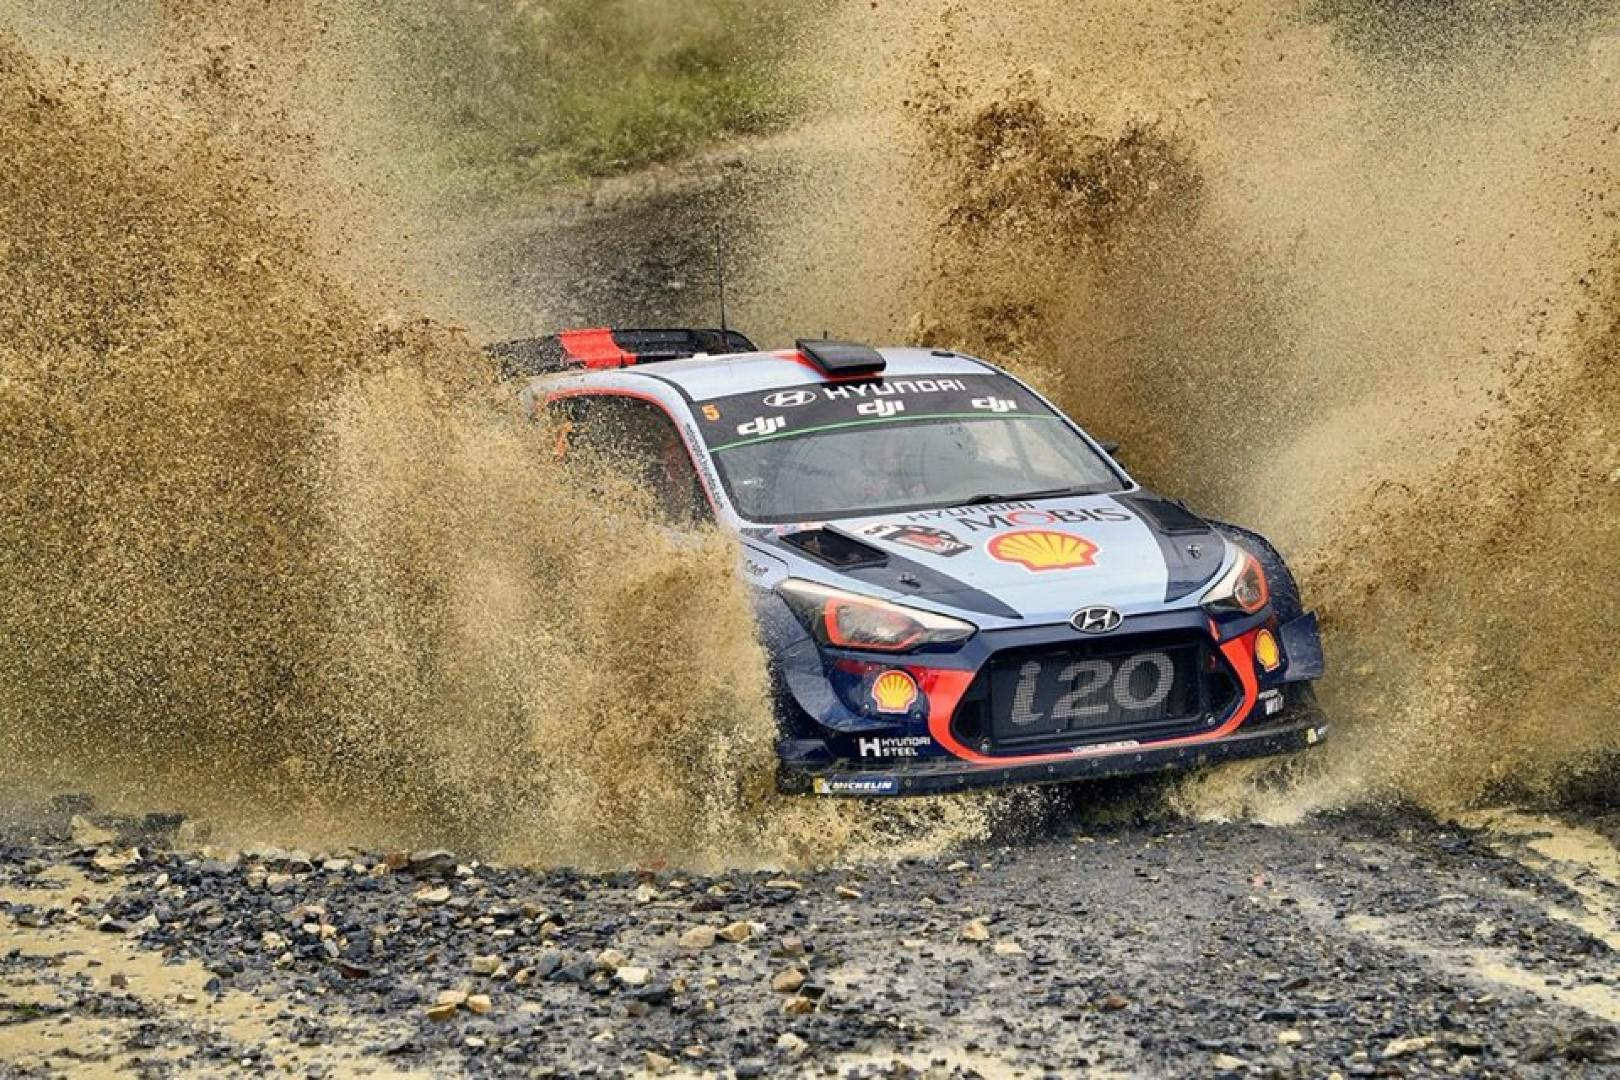 Rallye d'Australie 2017 : Mikkelsen domine la journée